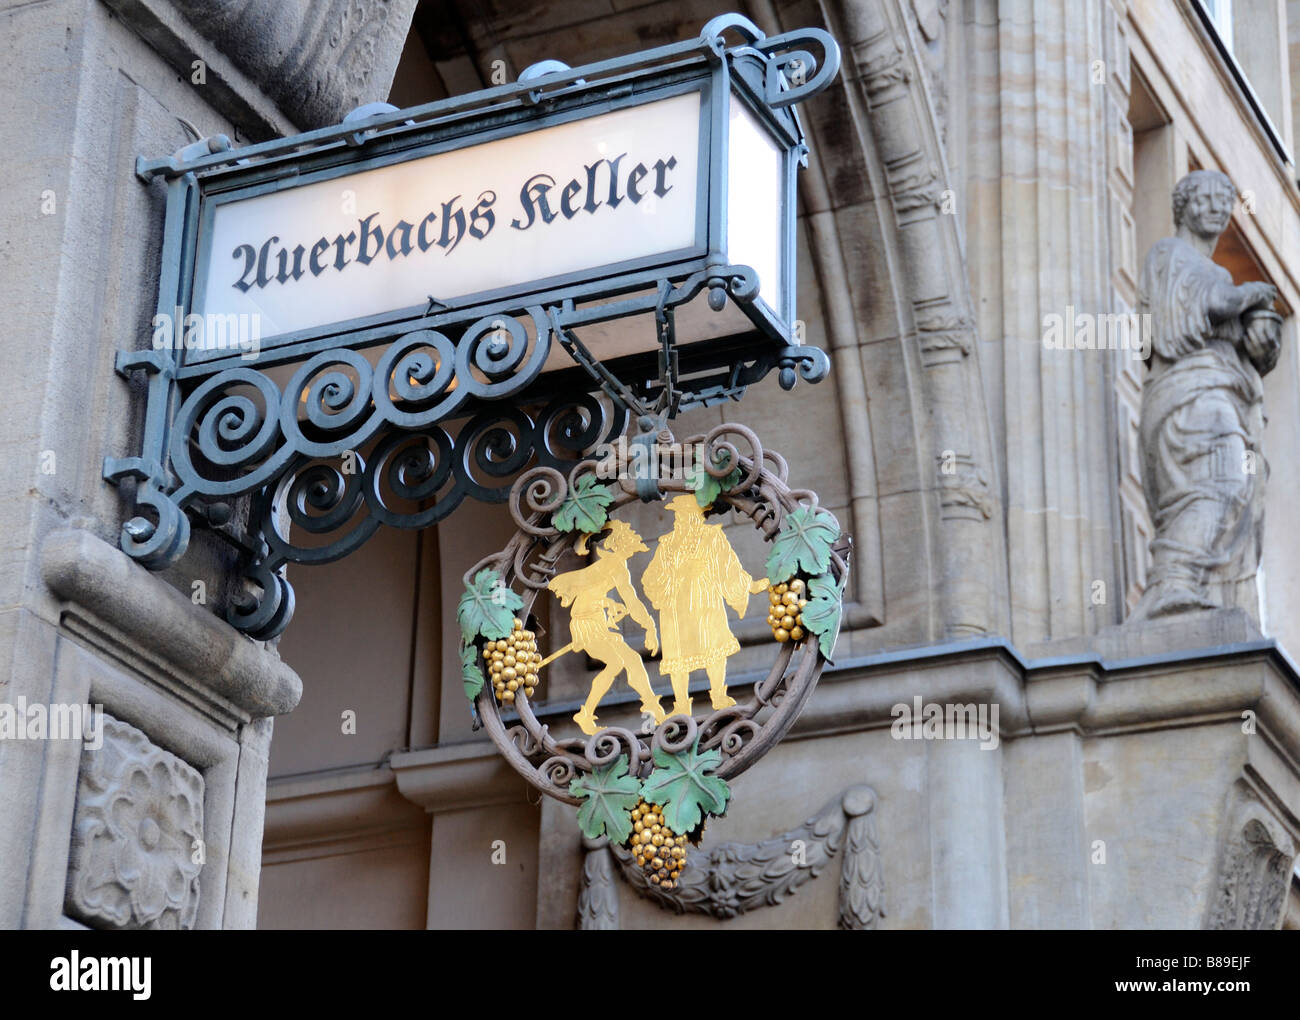 Leipzig sign to Auerbachs Keller restaurant - Stock Image